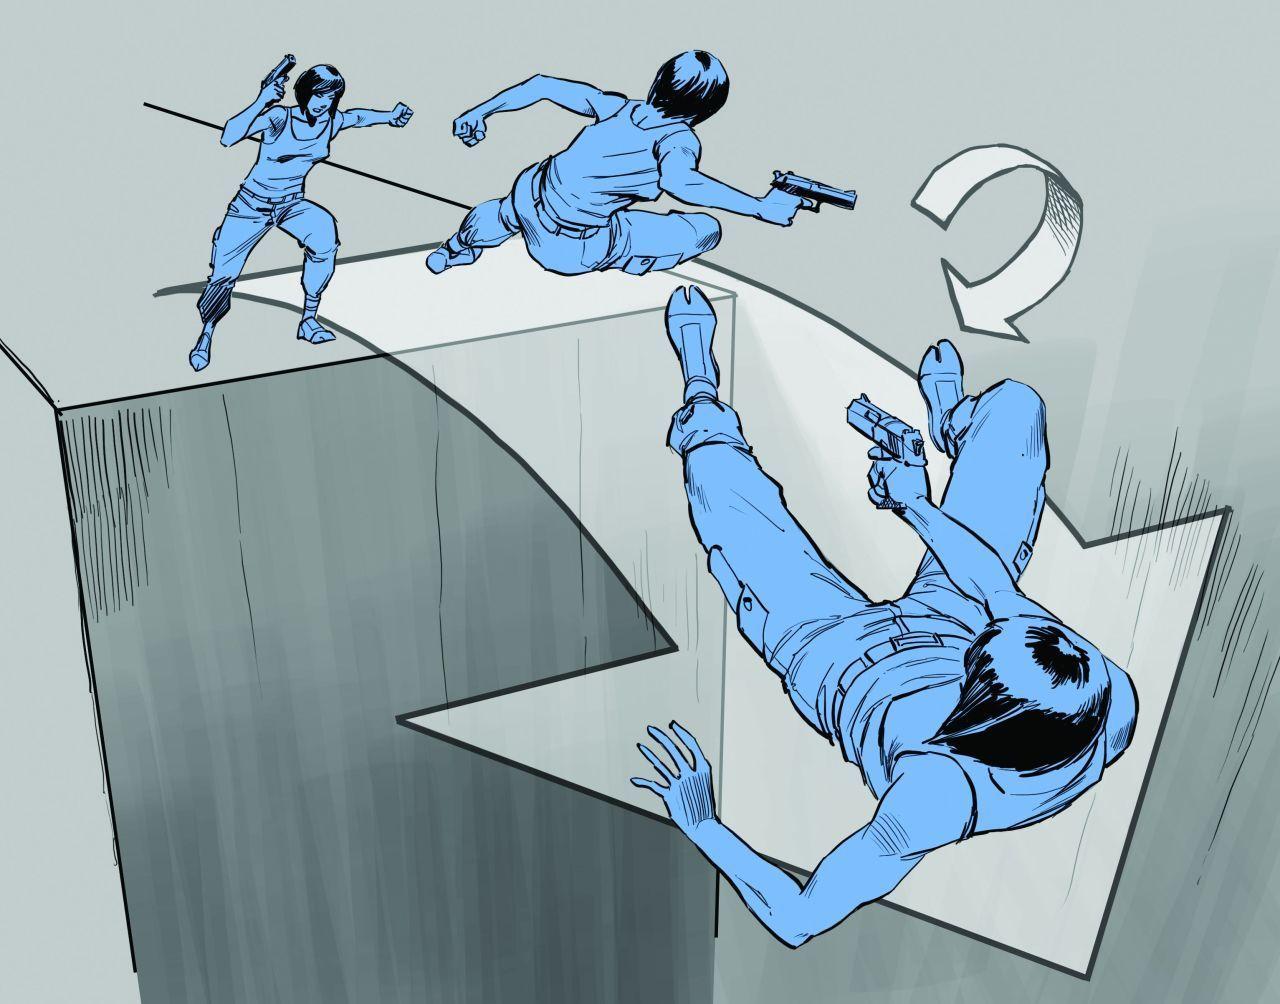 Comic/storyboard style